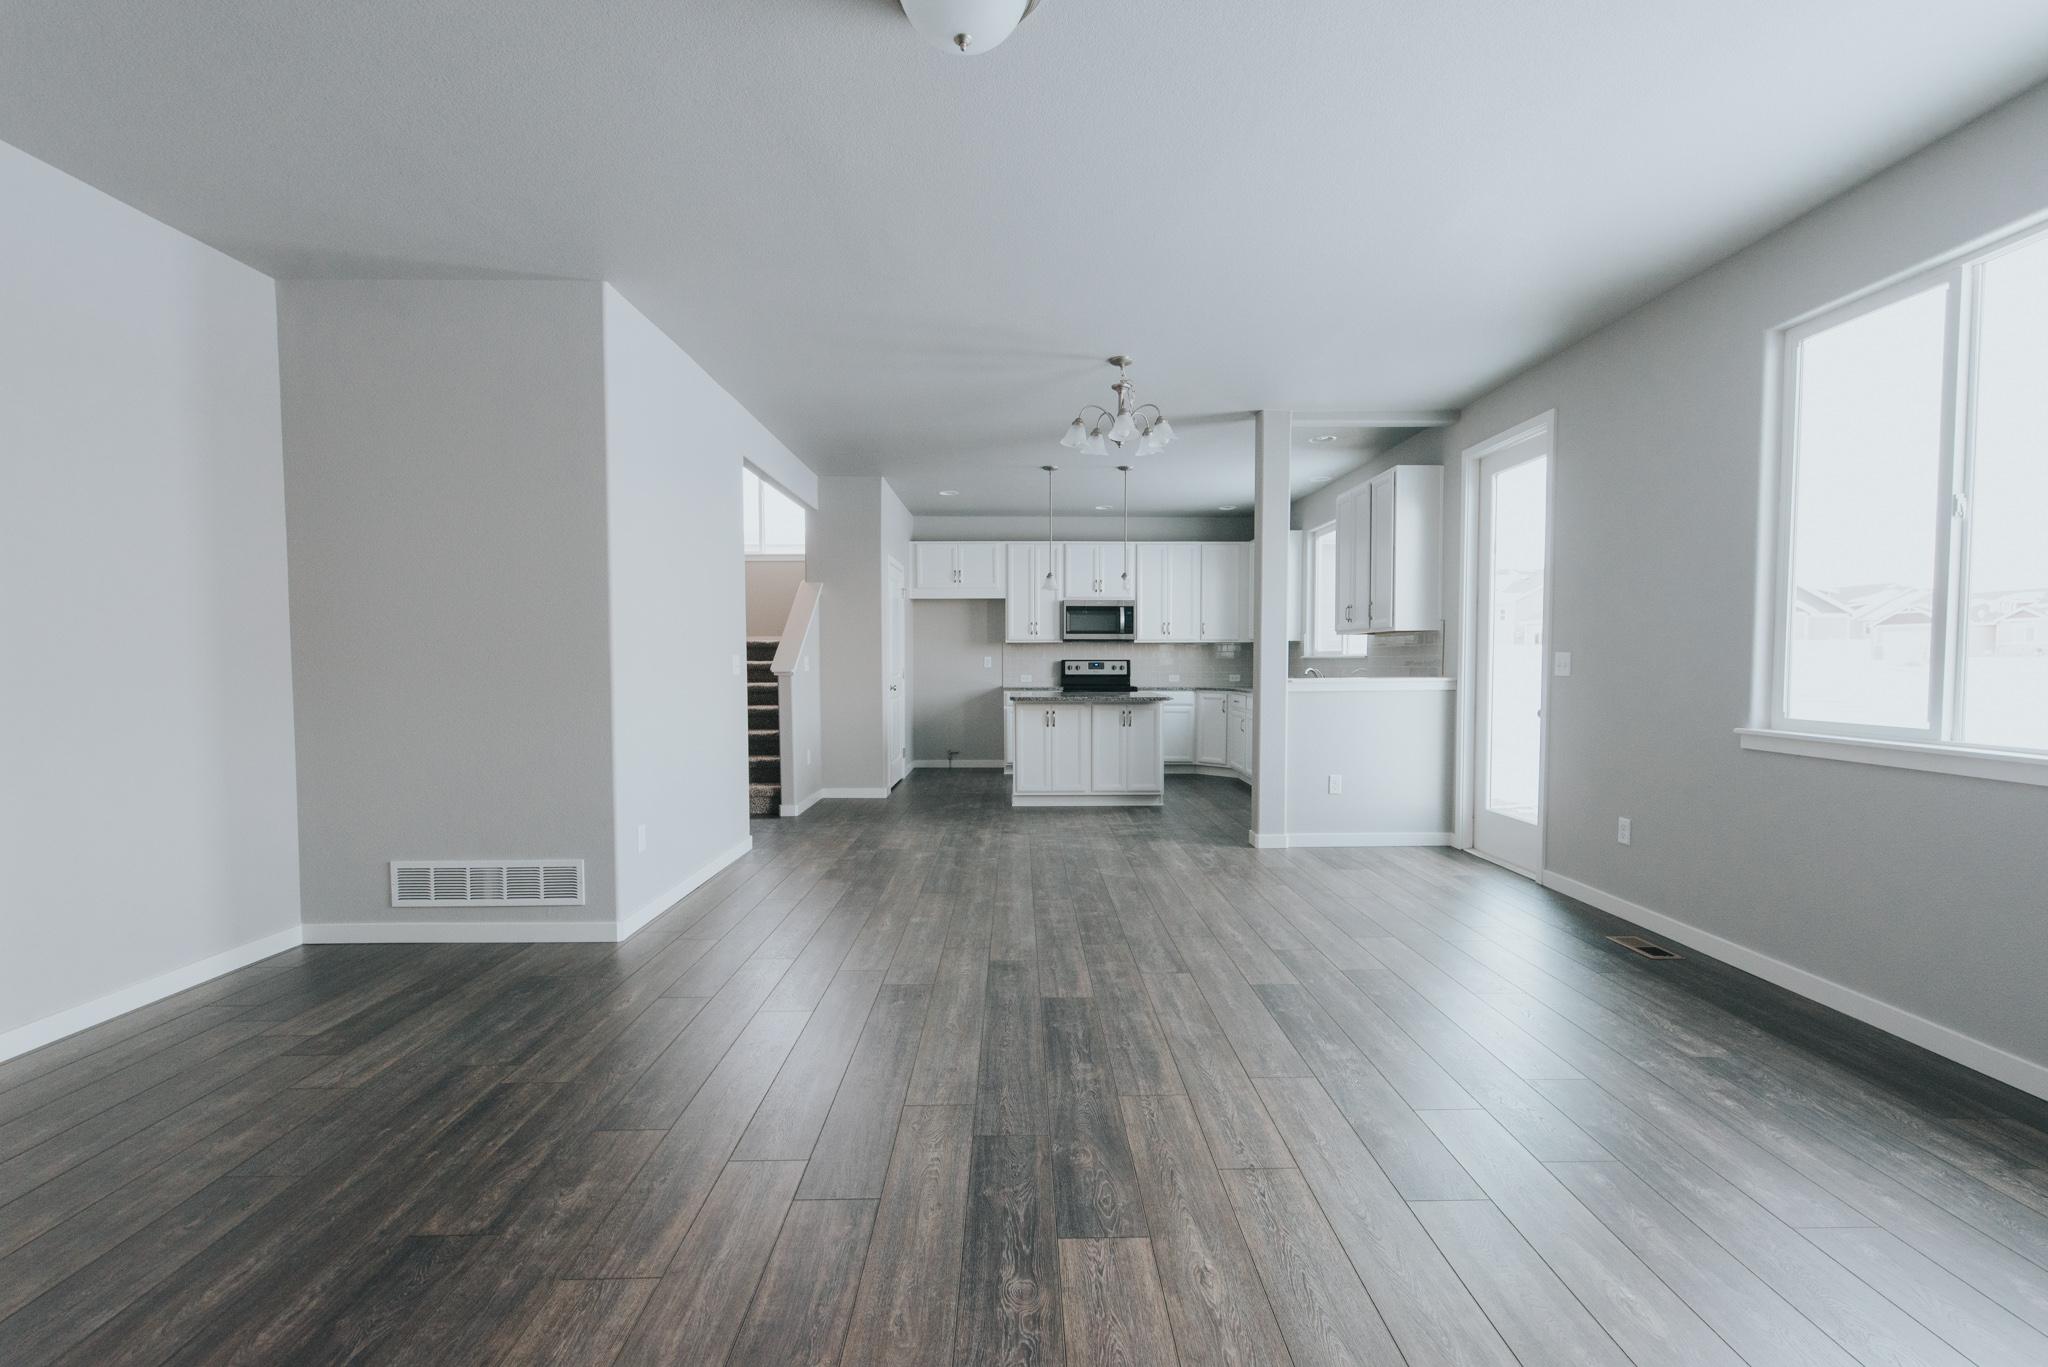 Real Estate - Interiors